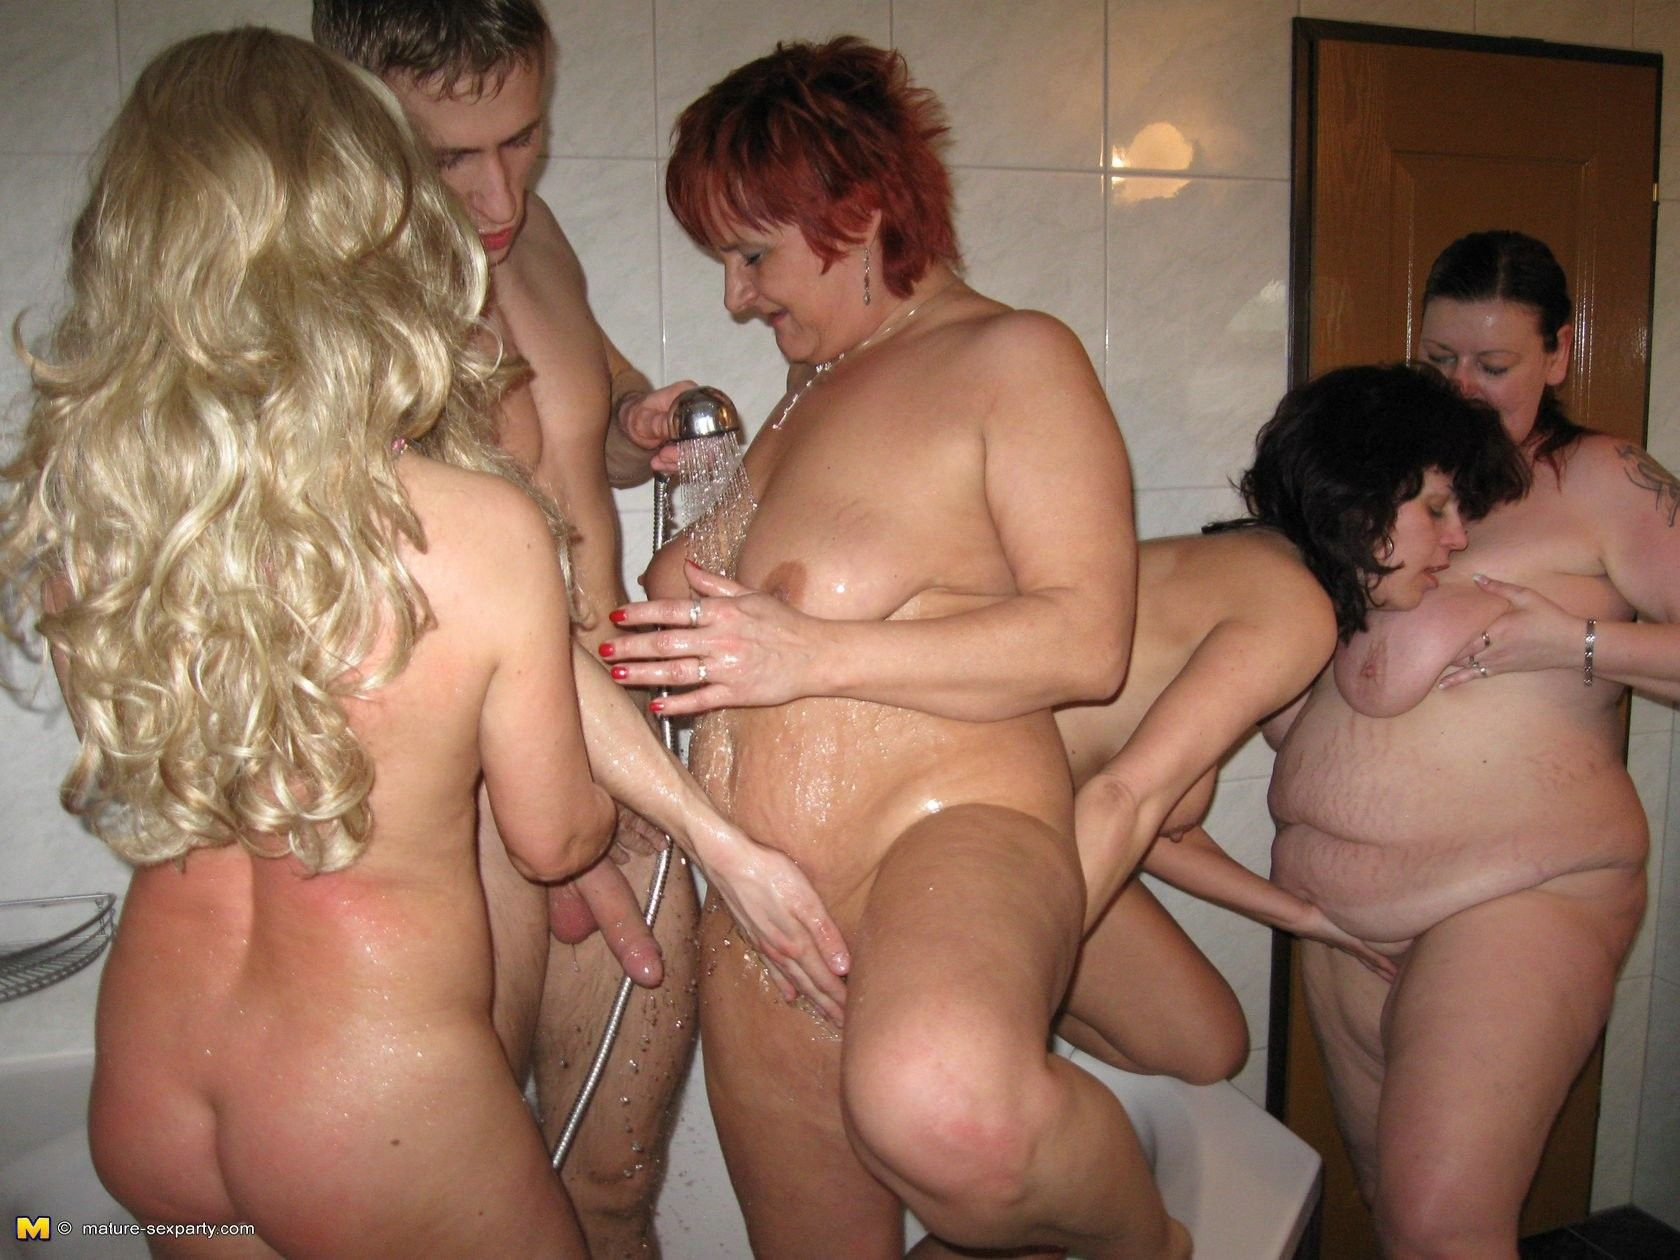 Milf hardcore perverse orgy party